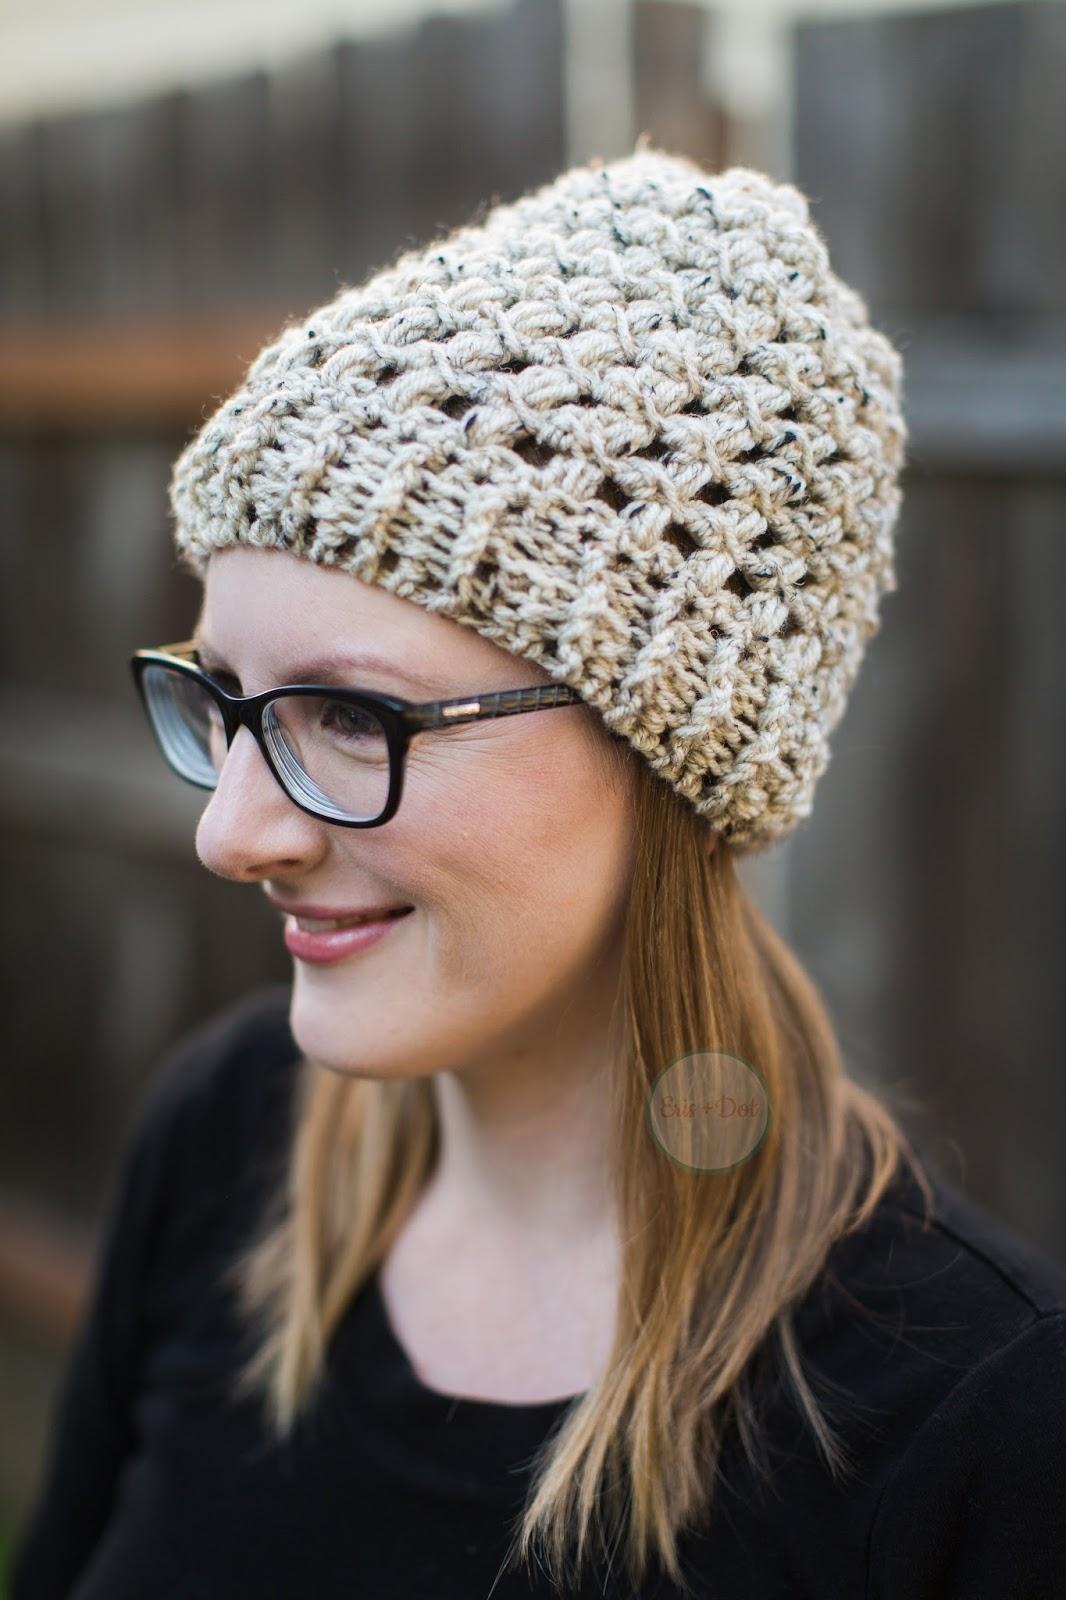 Parker Crochet Beanie, Slouchy Beanie, Crochet Beanie, Tri-Color Beanie, 3 Color Beanie, Women's, Teen, Crochet Hat